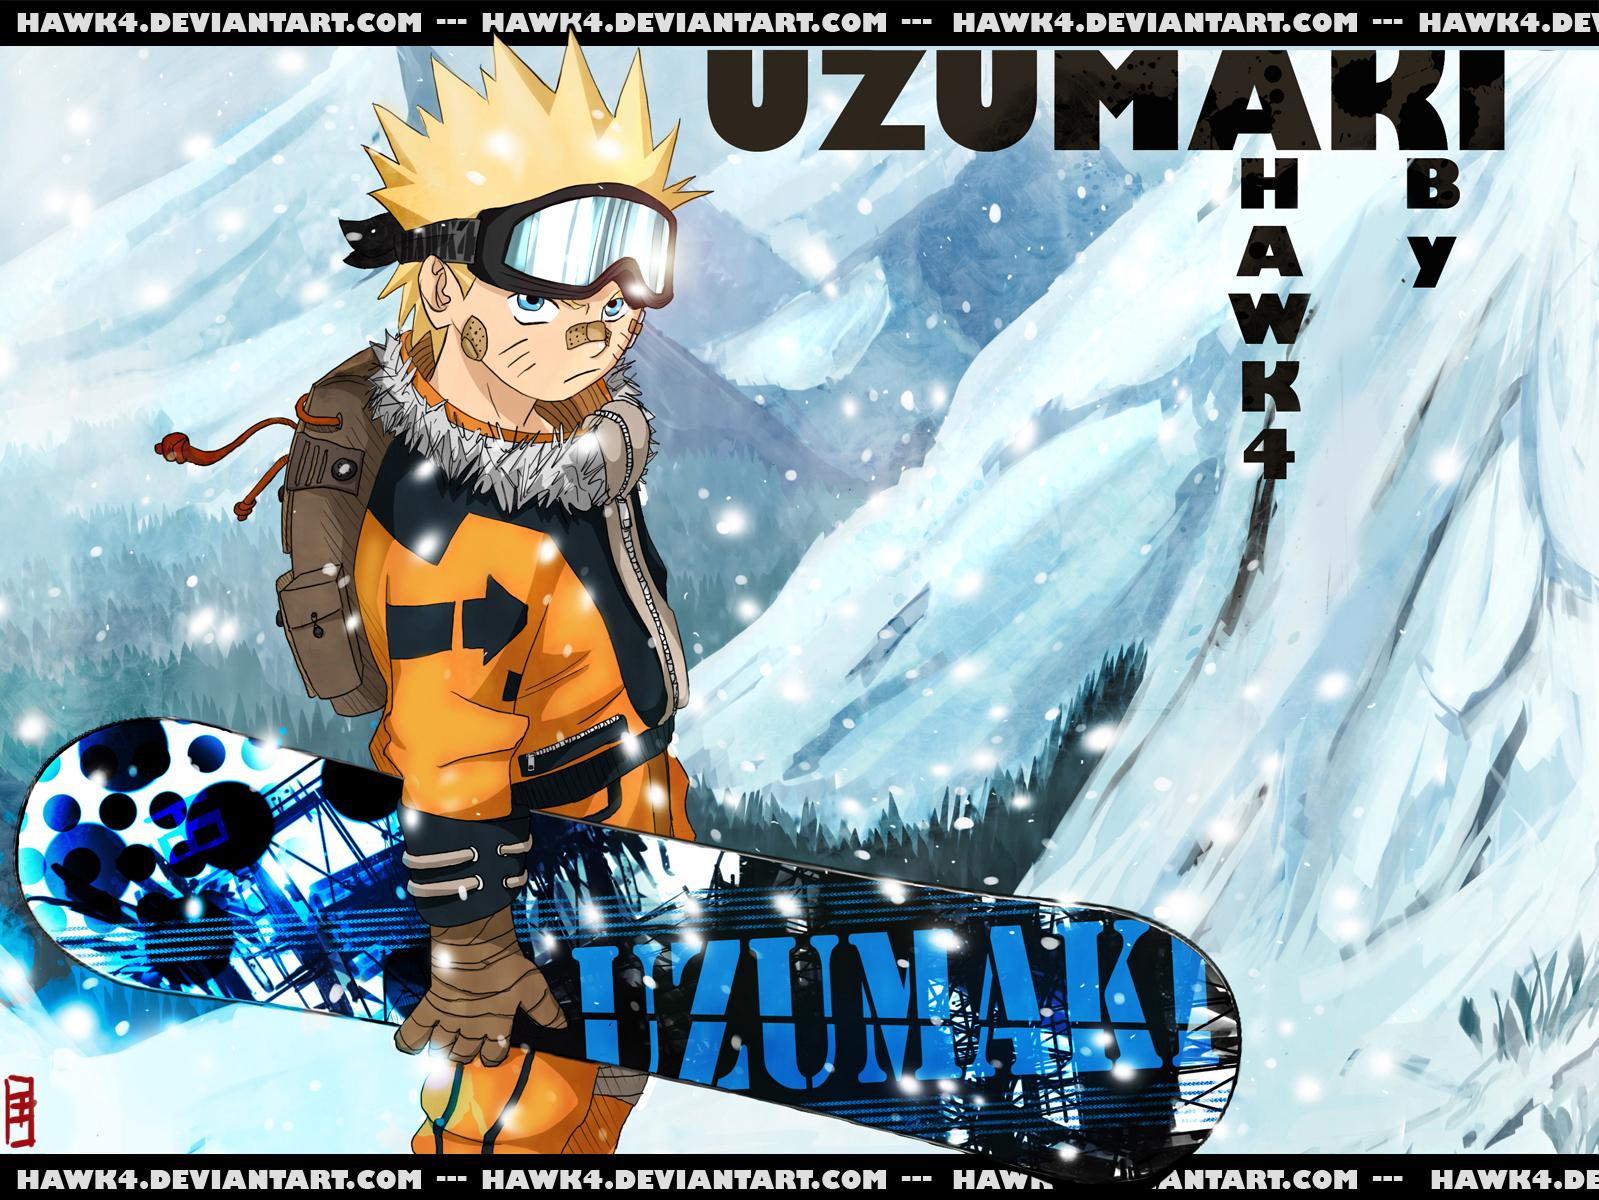 http://fc00.deviantart.net/fs24/f/2007/359/d/7/Naruto_Extreme_Wallpaper_by_Hawk4.jpg